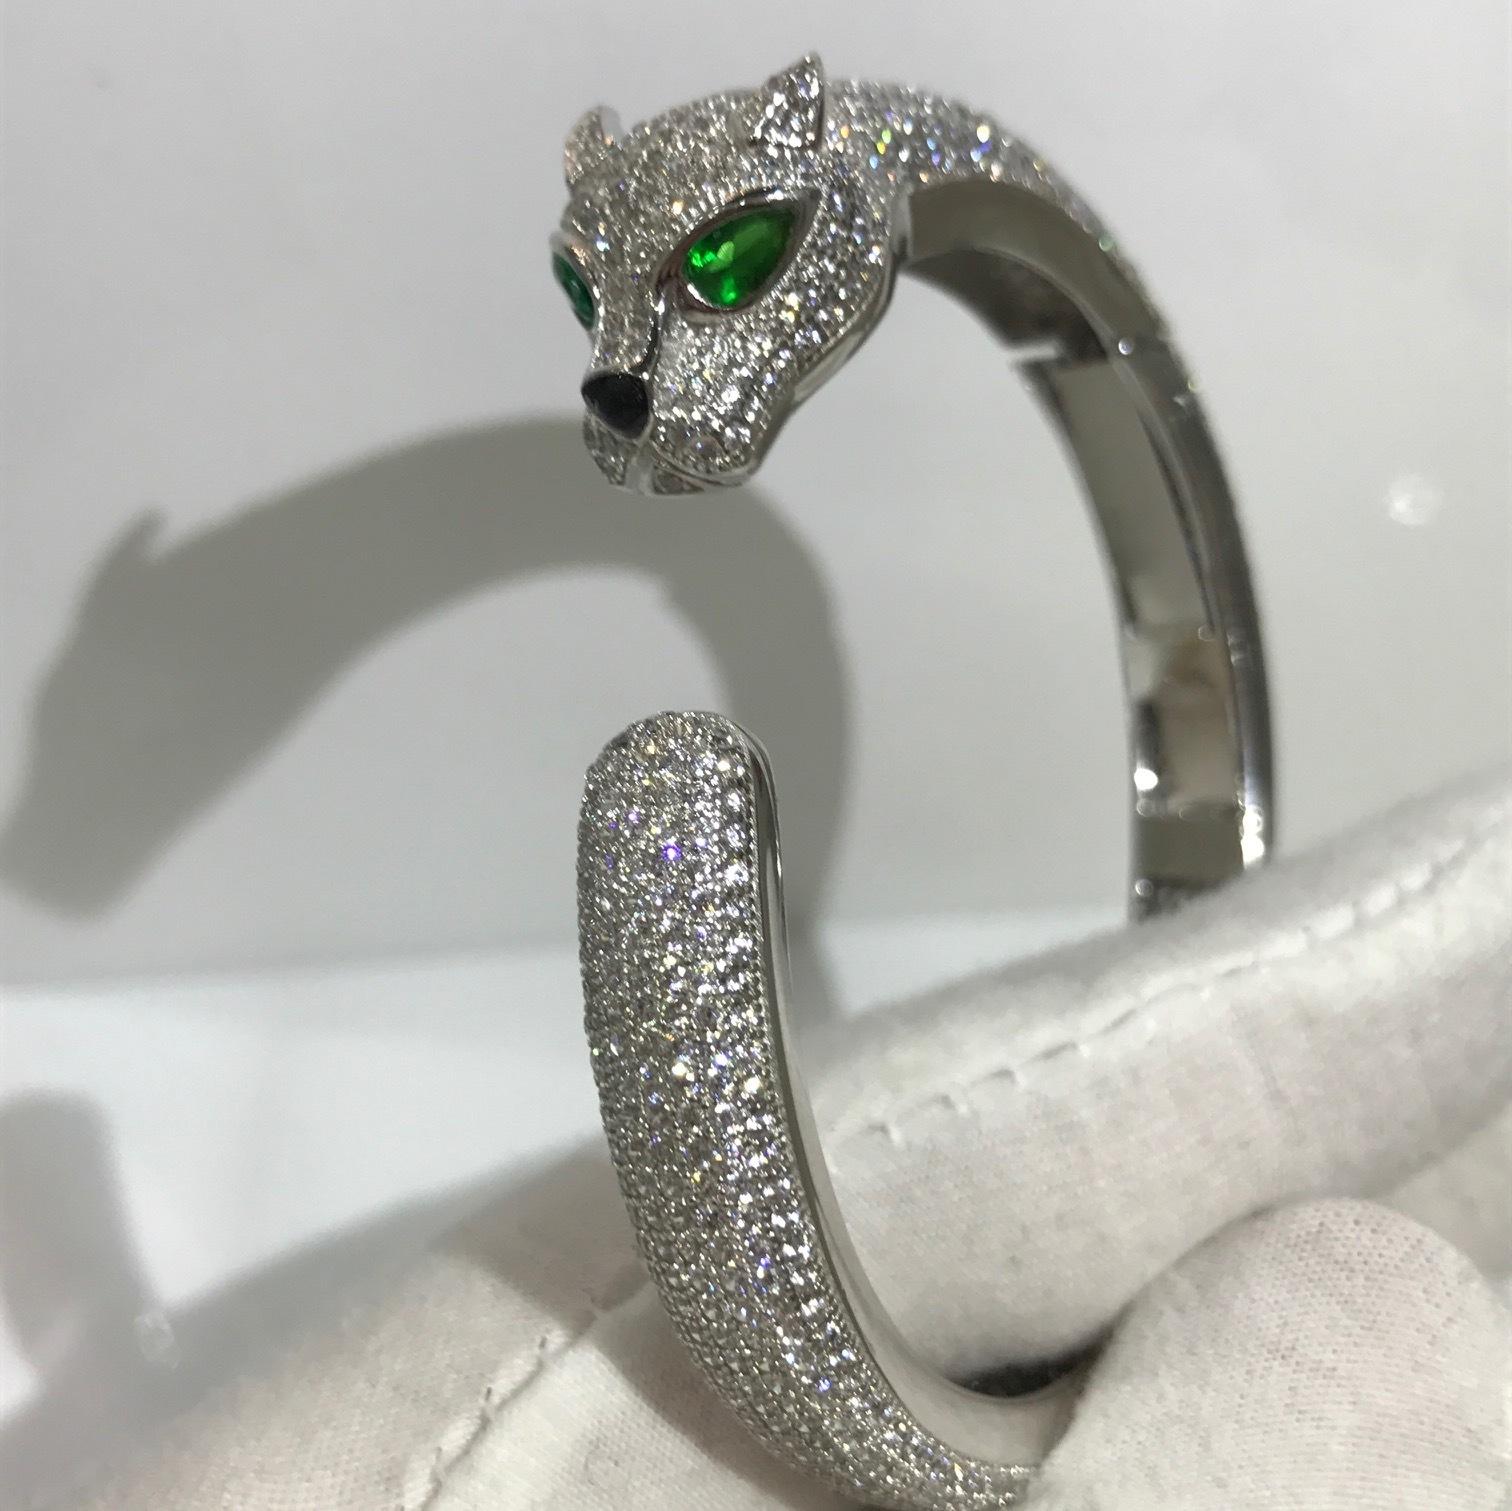 VintageFlowertop Jewelry Finds Leopard Bangle Bracelet Glam Leopard Clamper